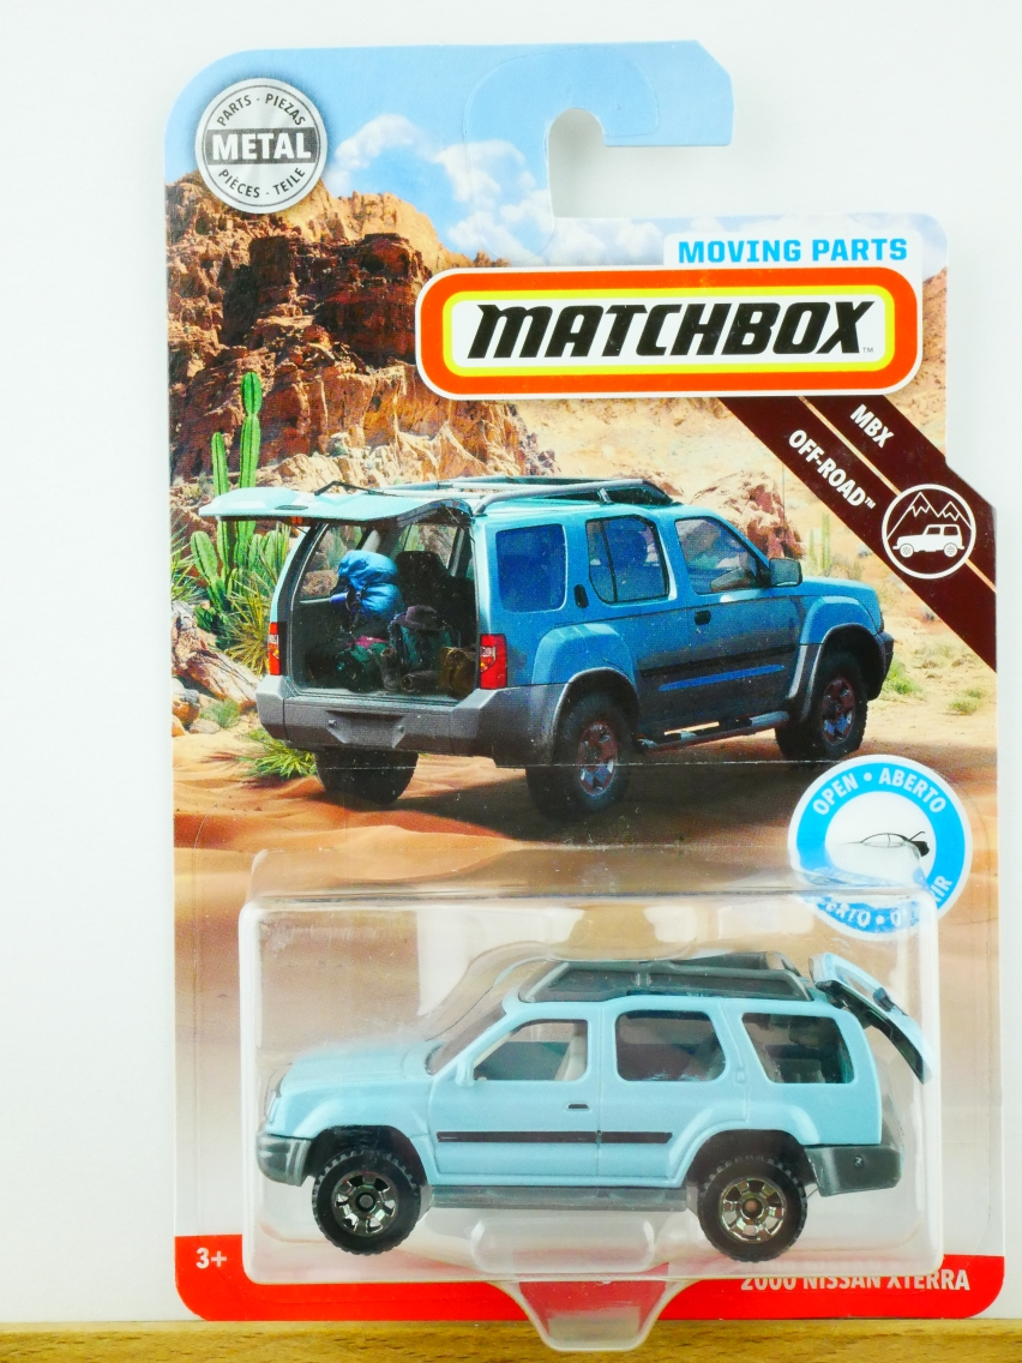 Matchbox Moving Parts 2000 Nissan Xterra - 13560